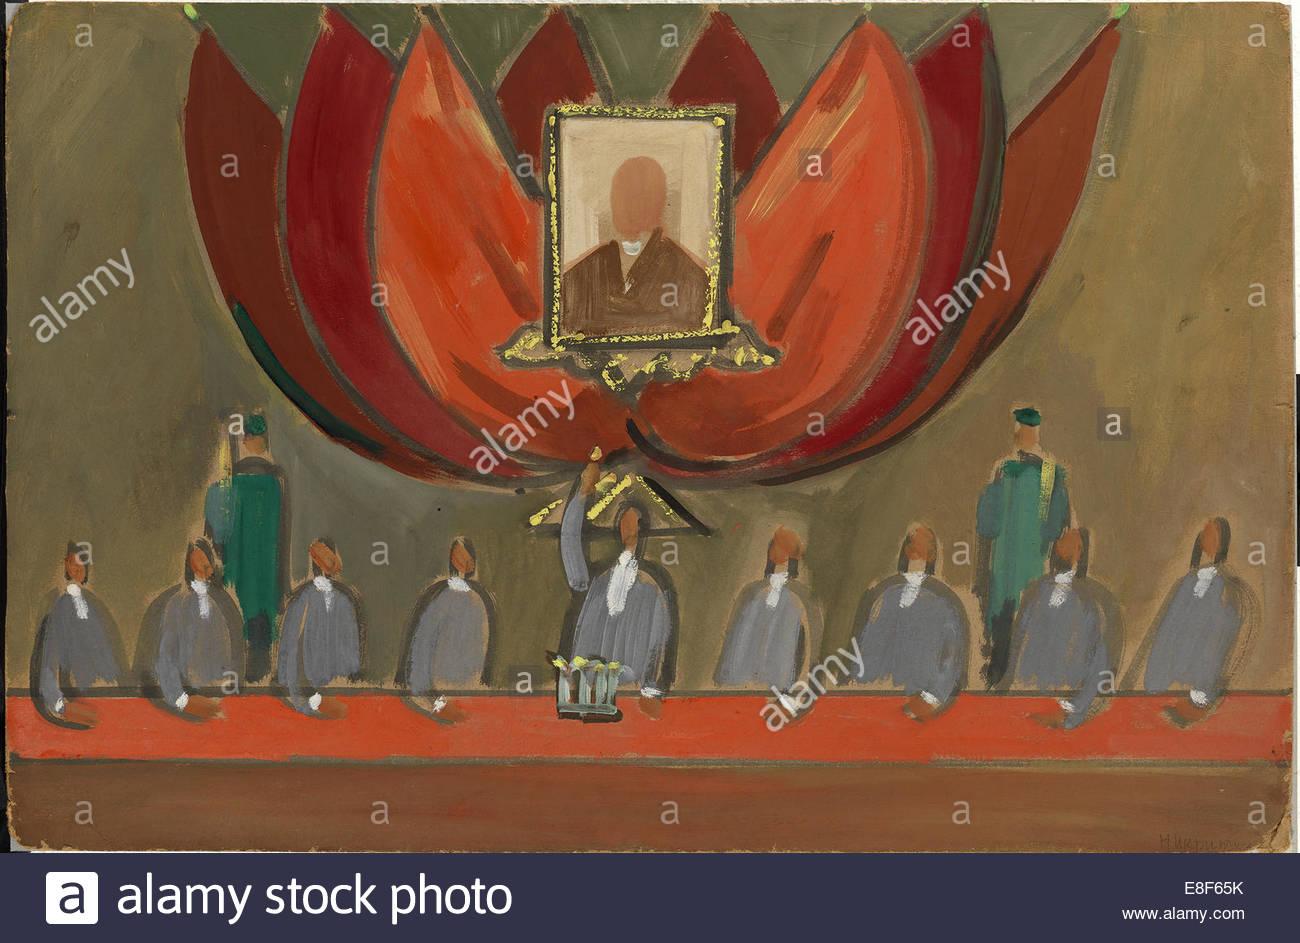 Corte. Artista: Nikritin, Solomon Borisovitch (1898-1965) Imagen De Stock